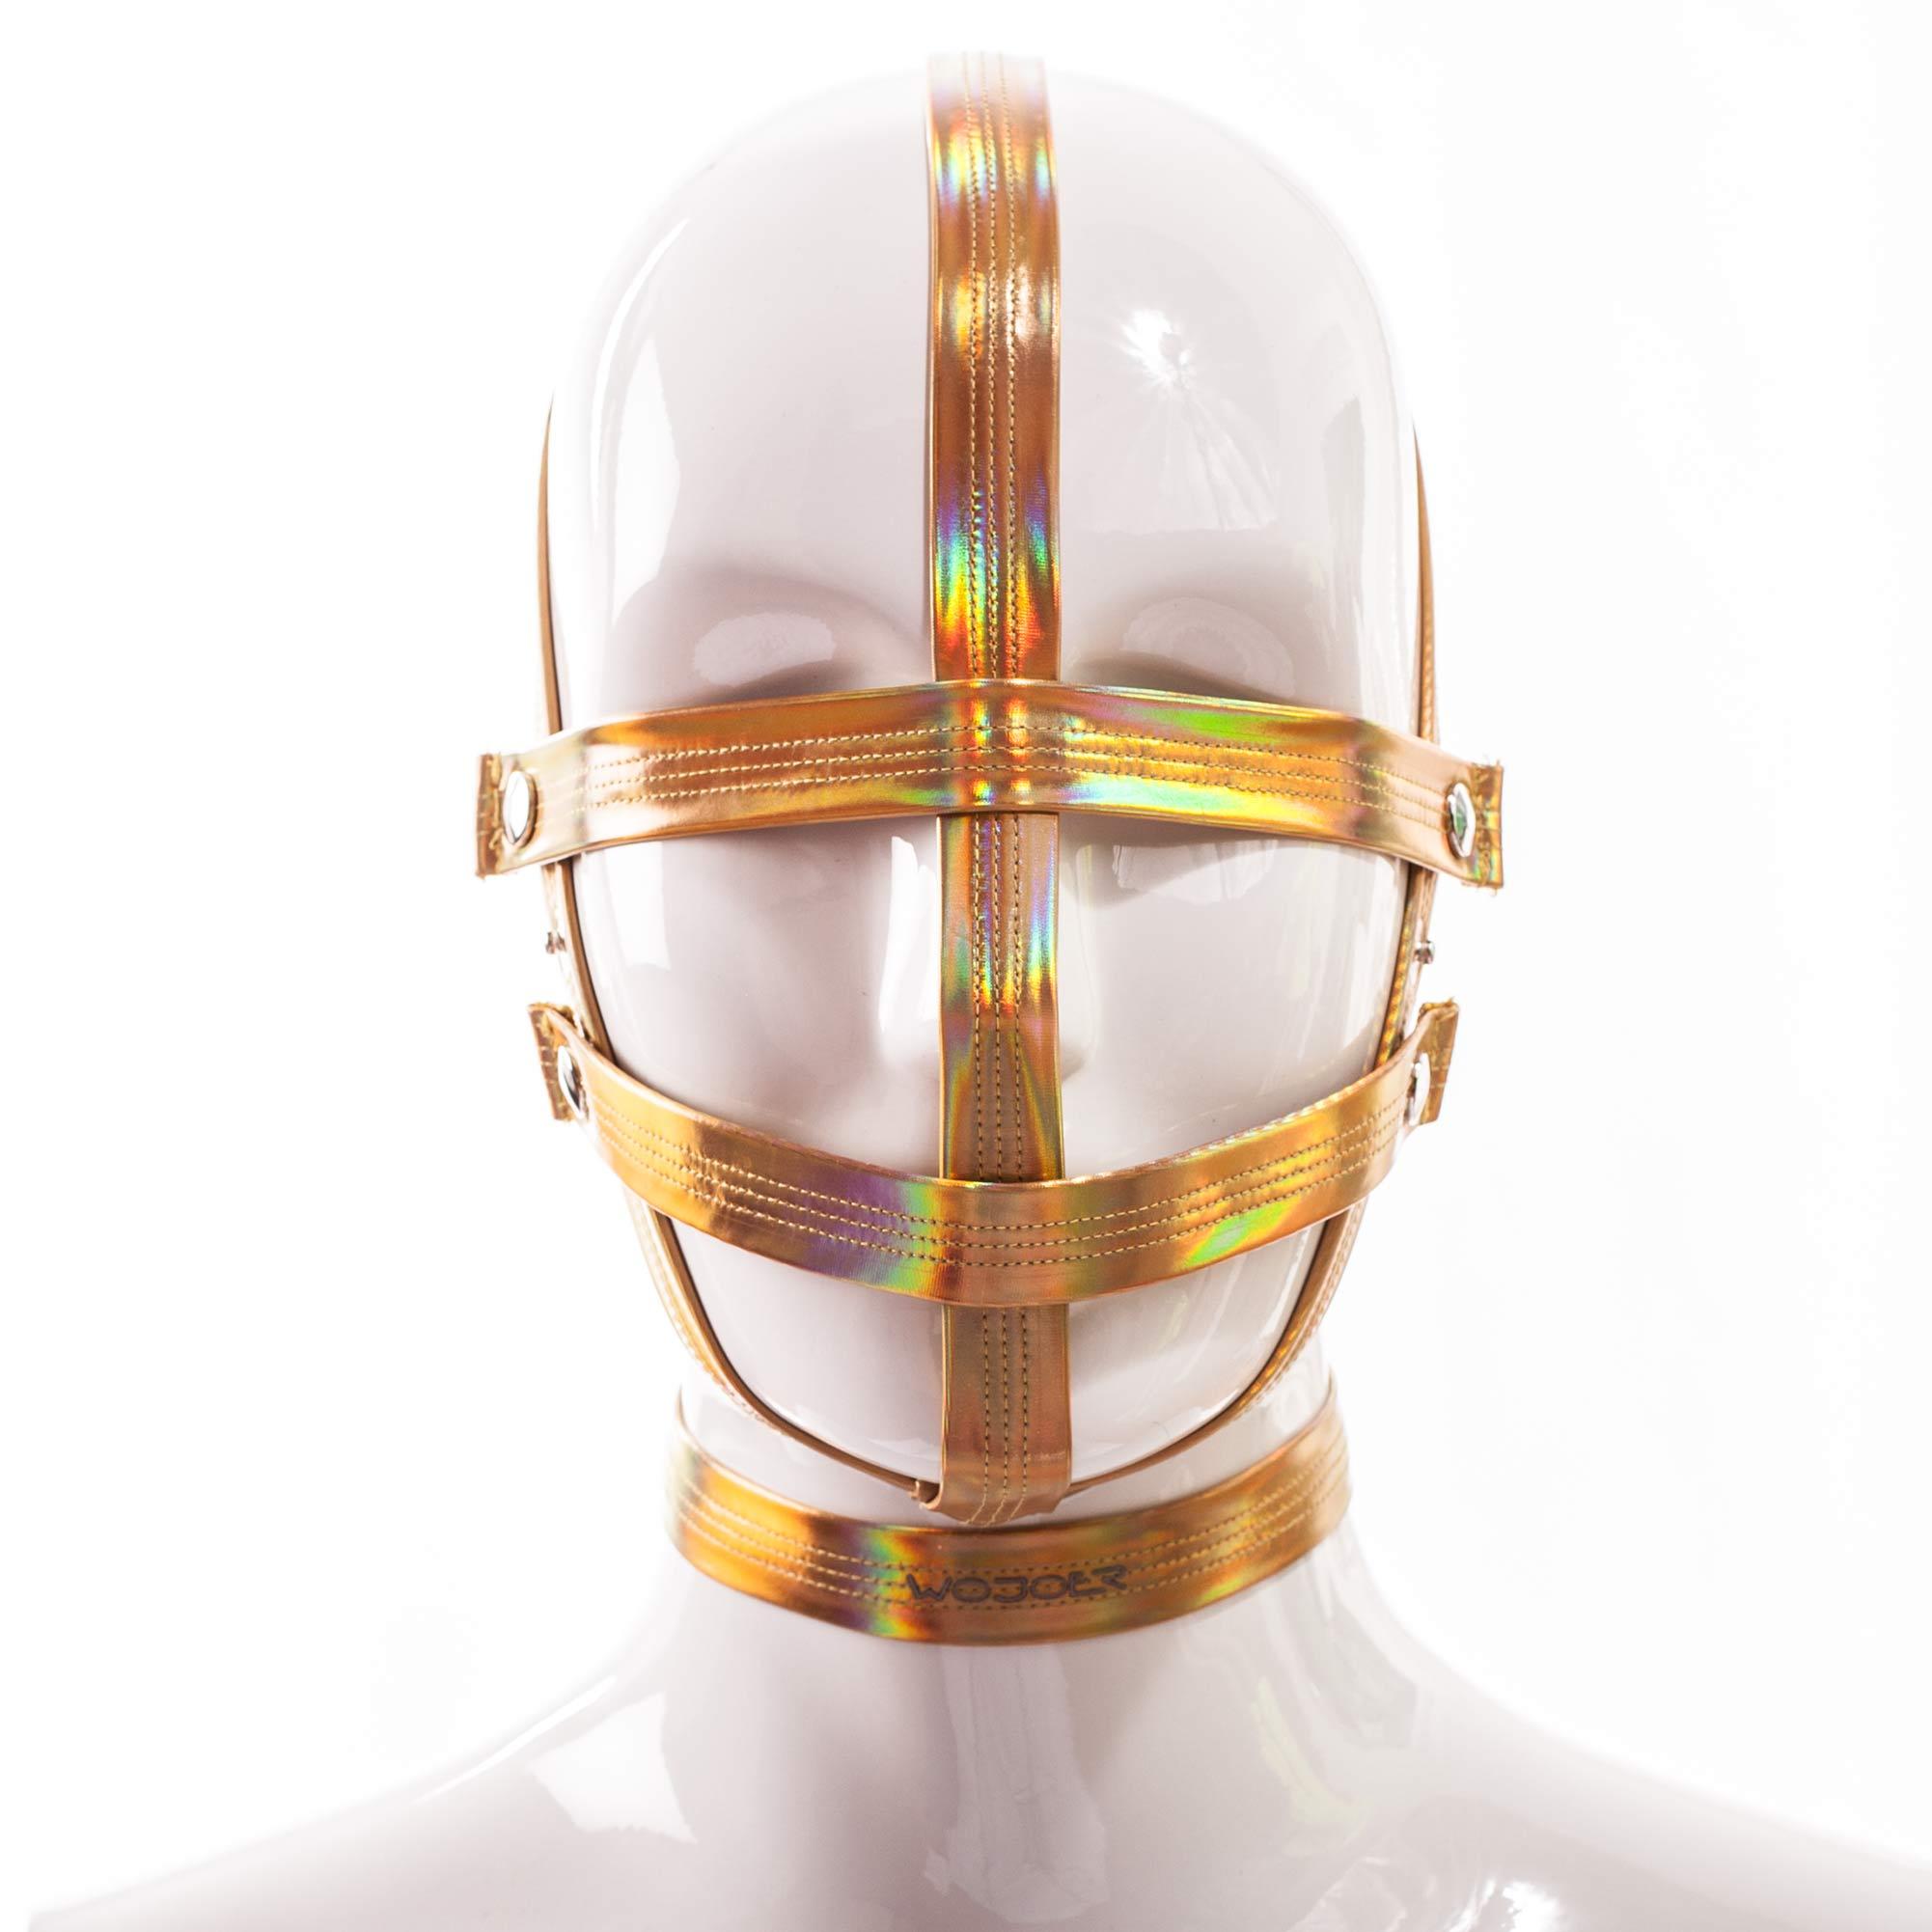 Golden Line, Gold Maske, gold glänzendes Lederimitat, Lack, dehnbar, verstellbar